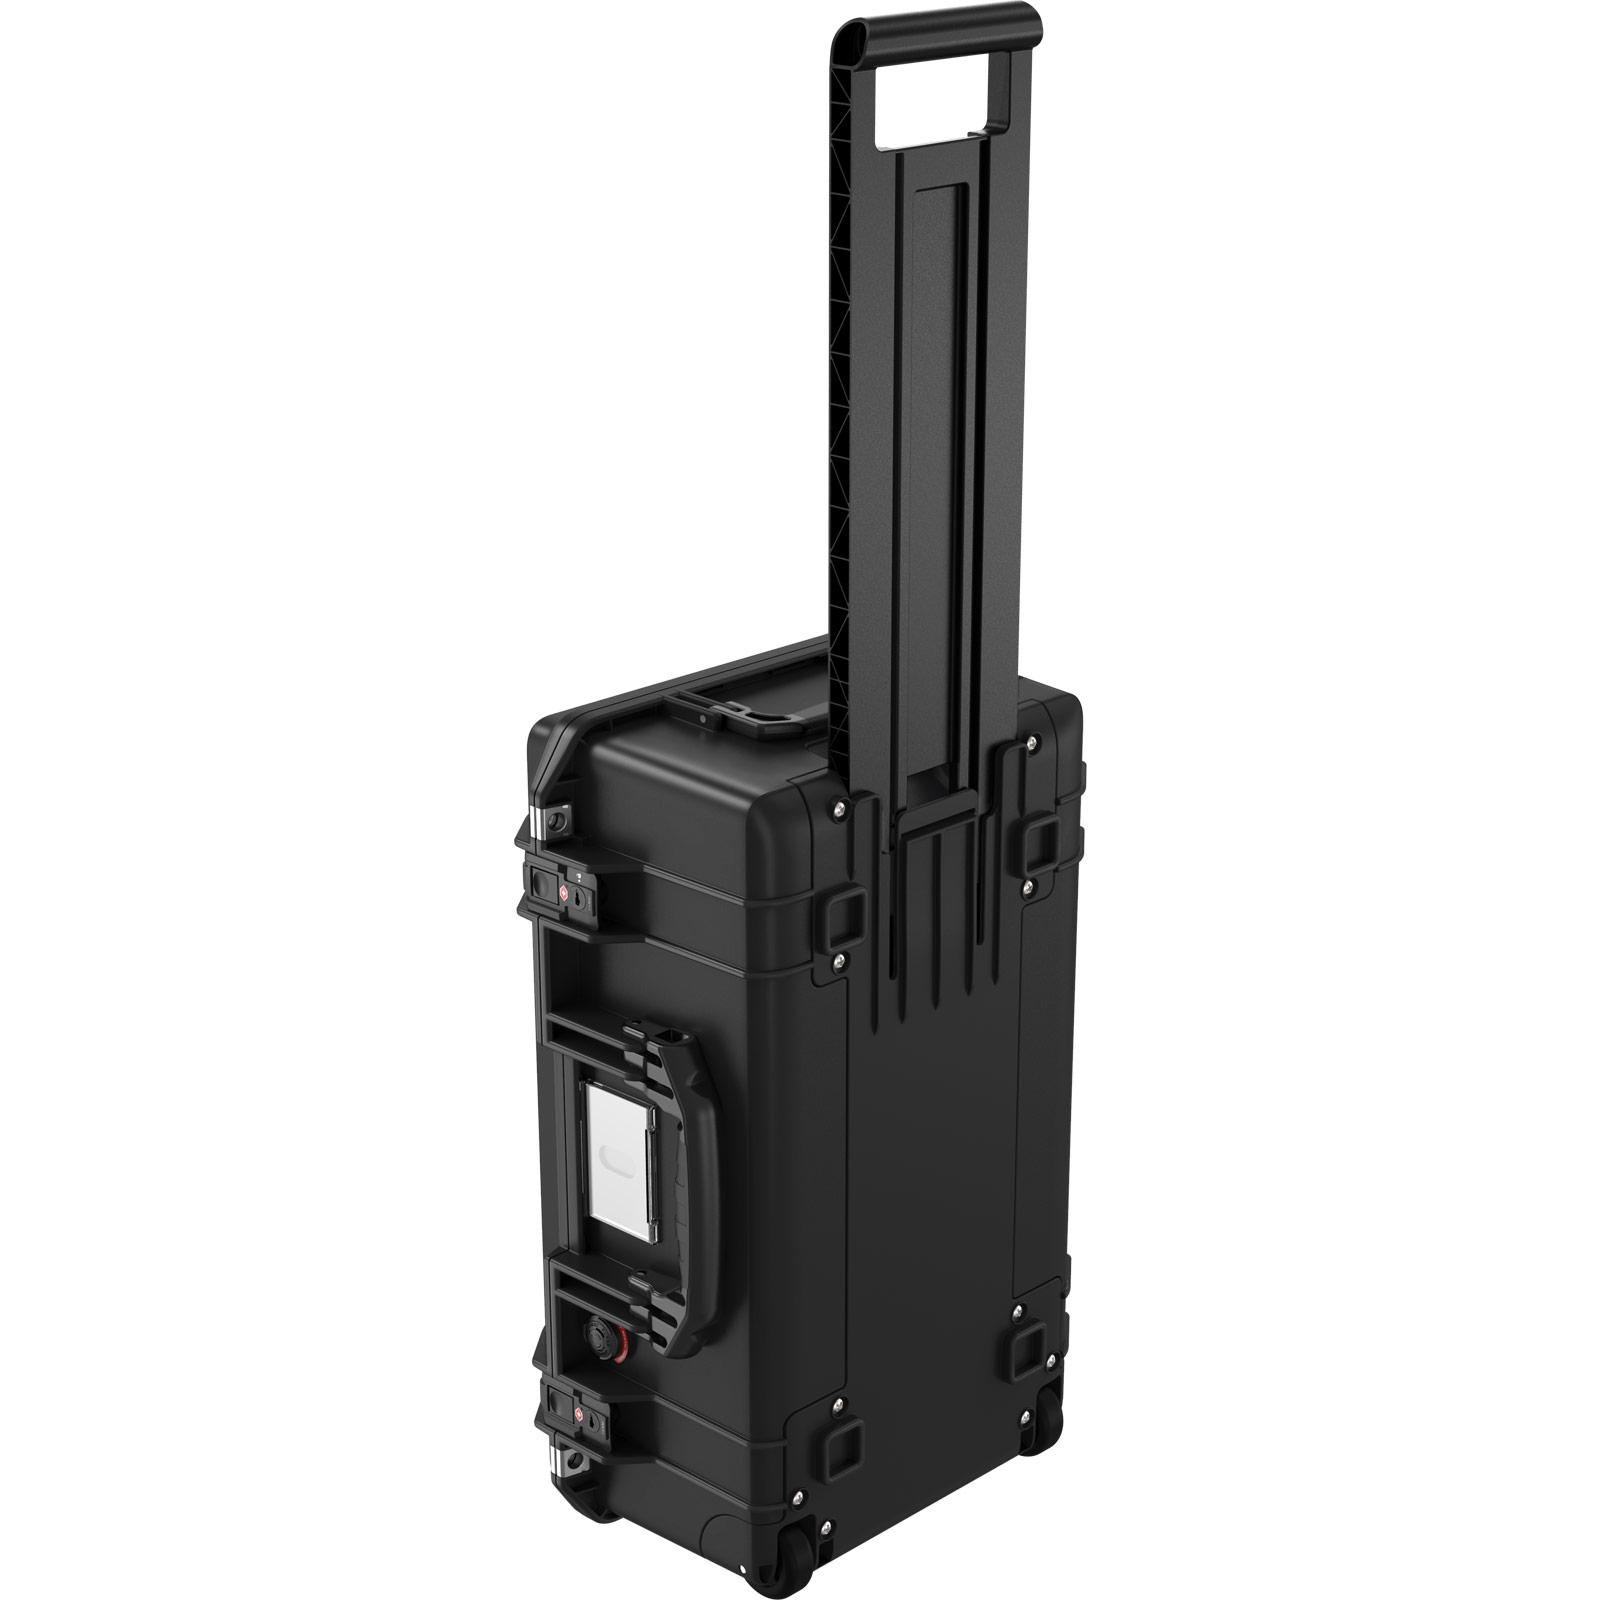 pelican 1535 air wheeled luggage case